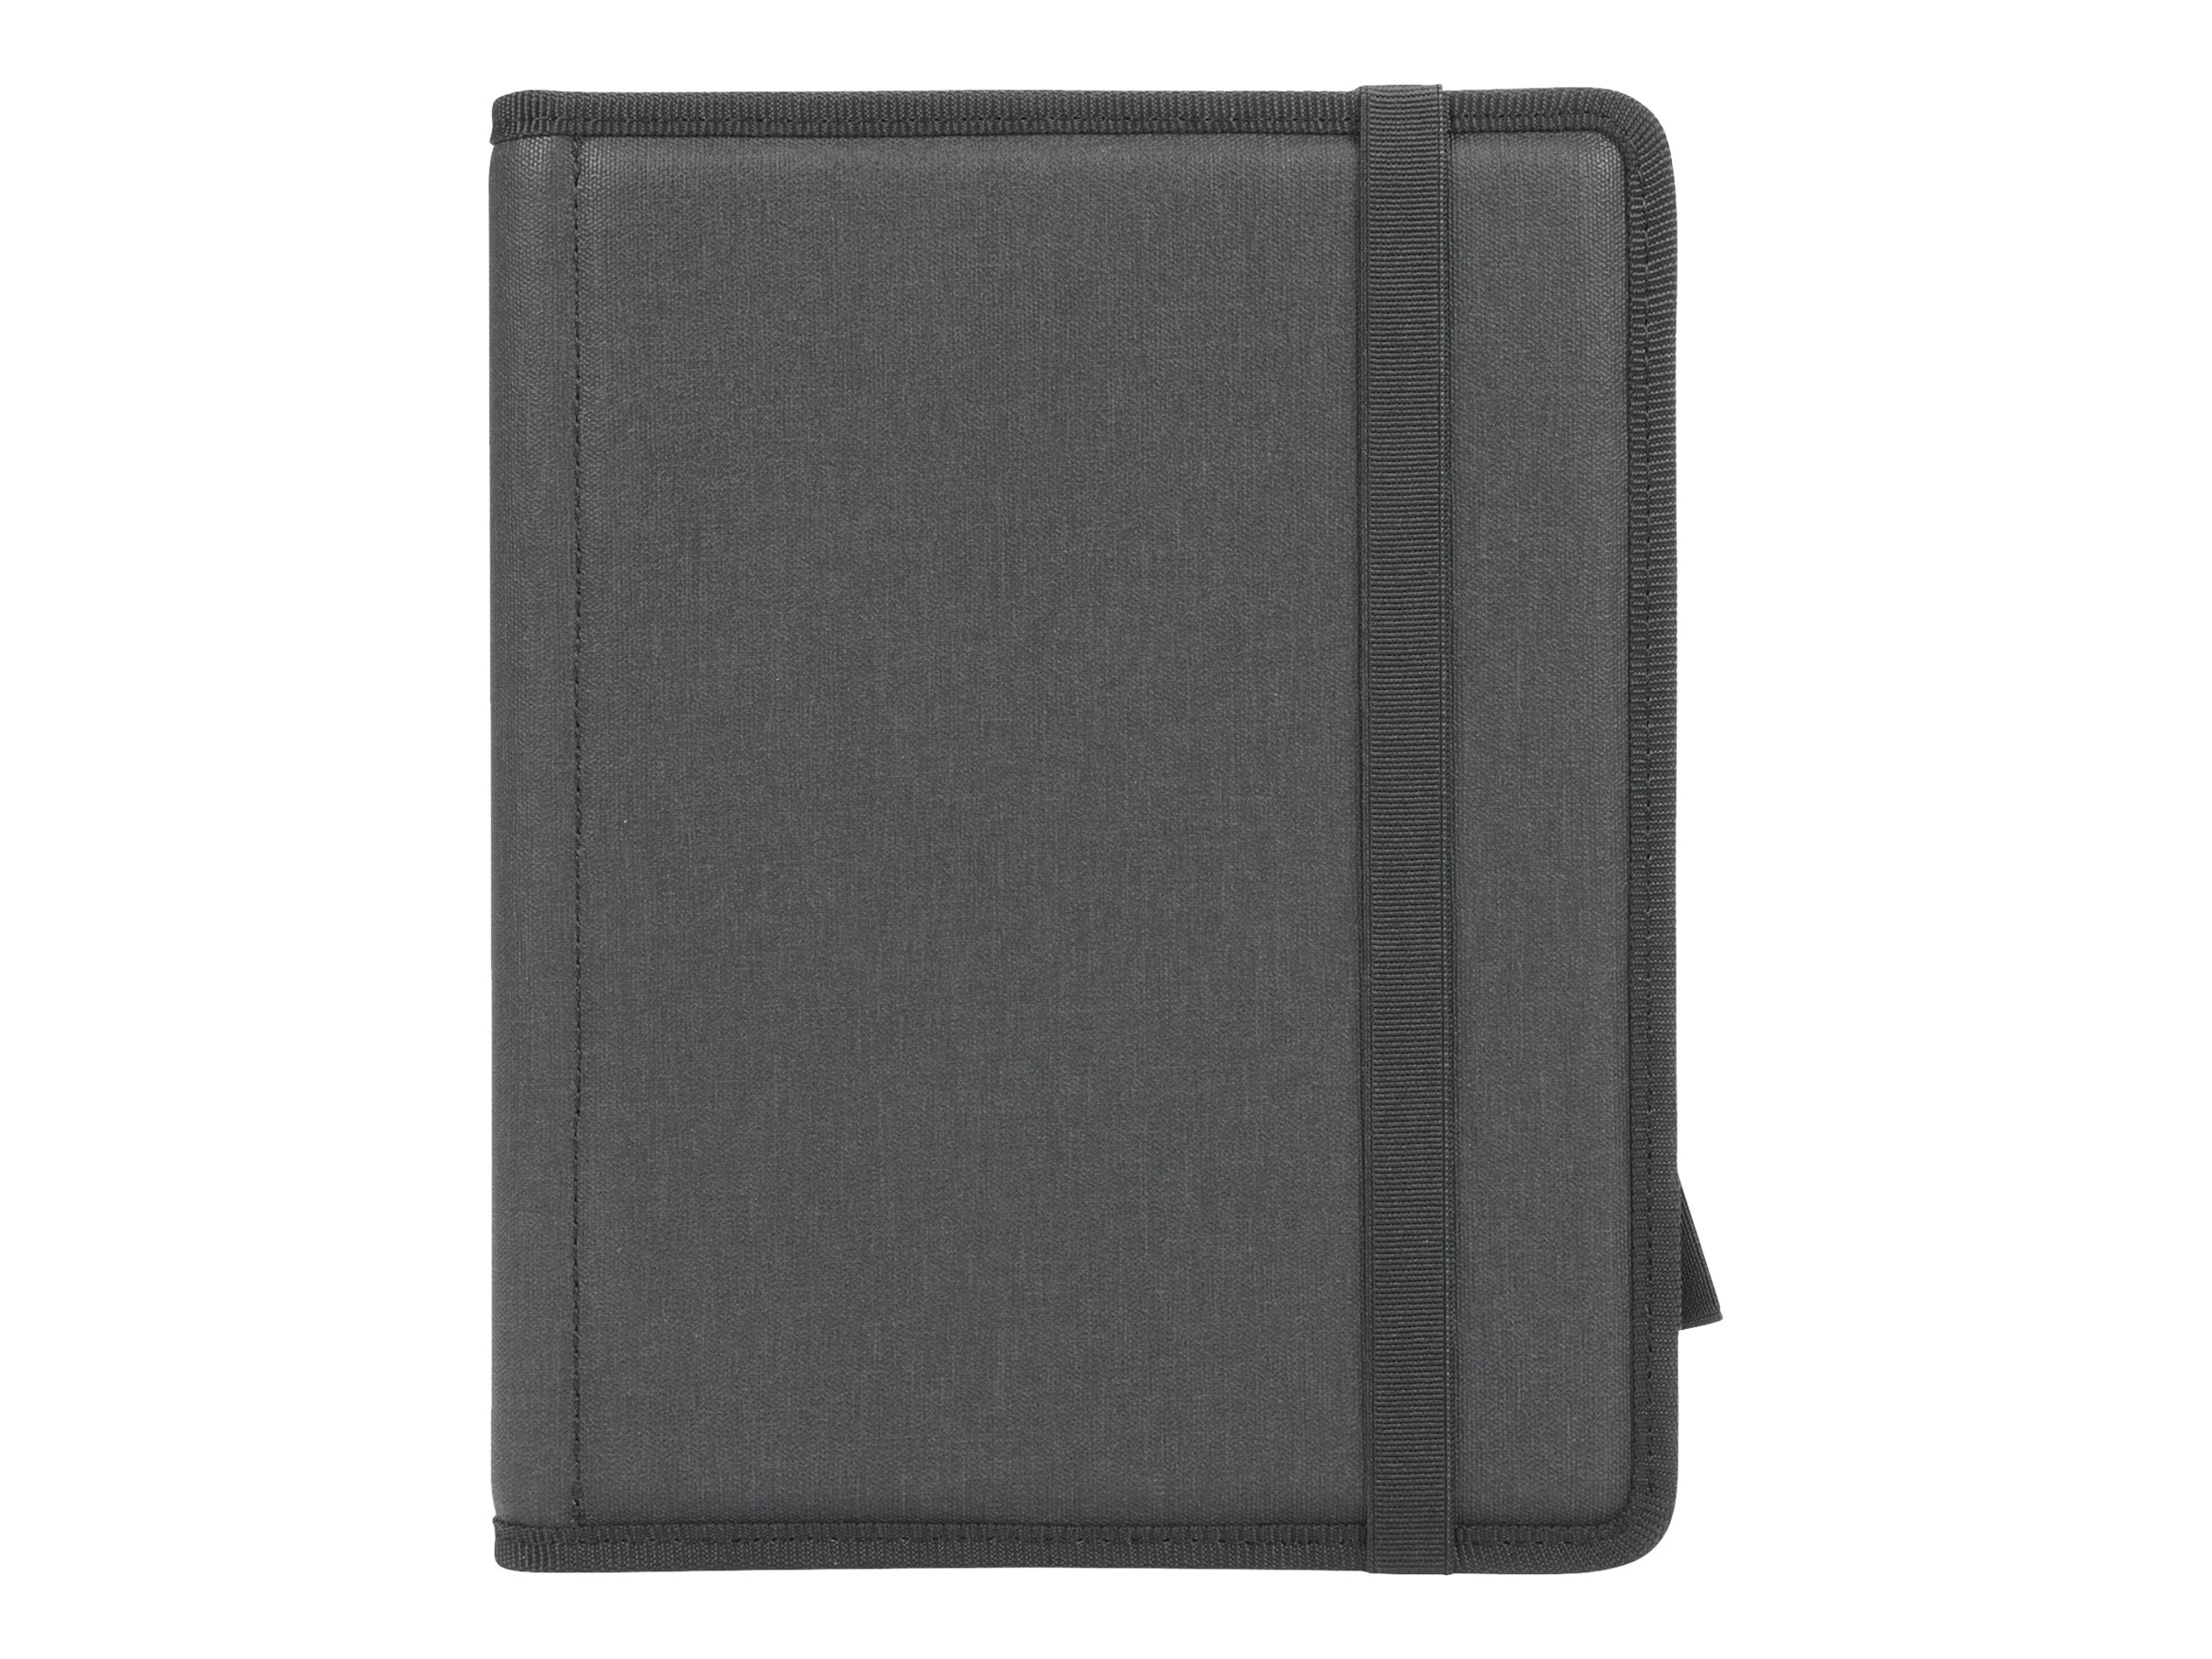 Mobilis ACTIV - Flip-Hülle für Tablet - Schwarz